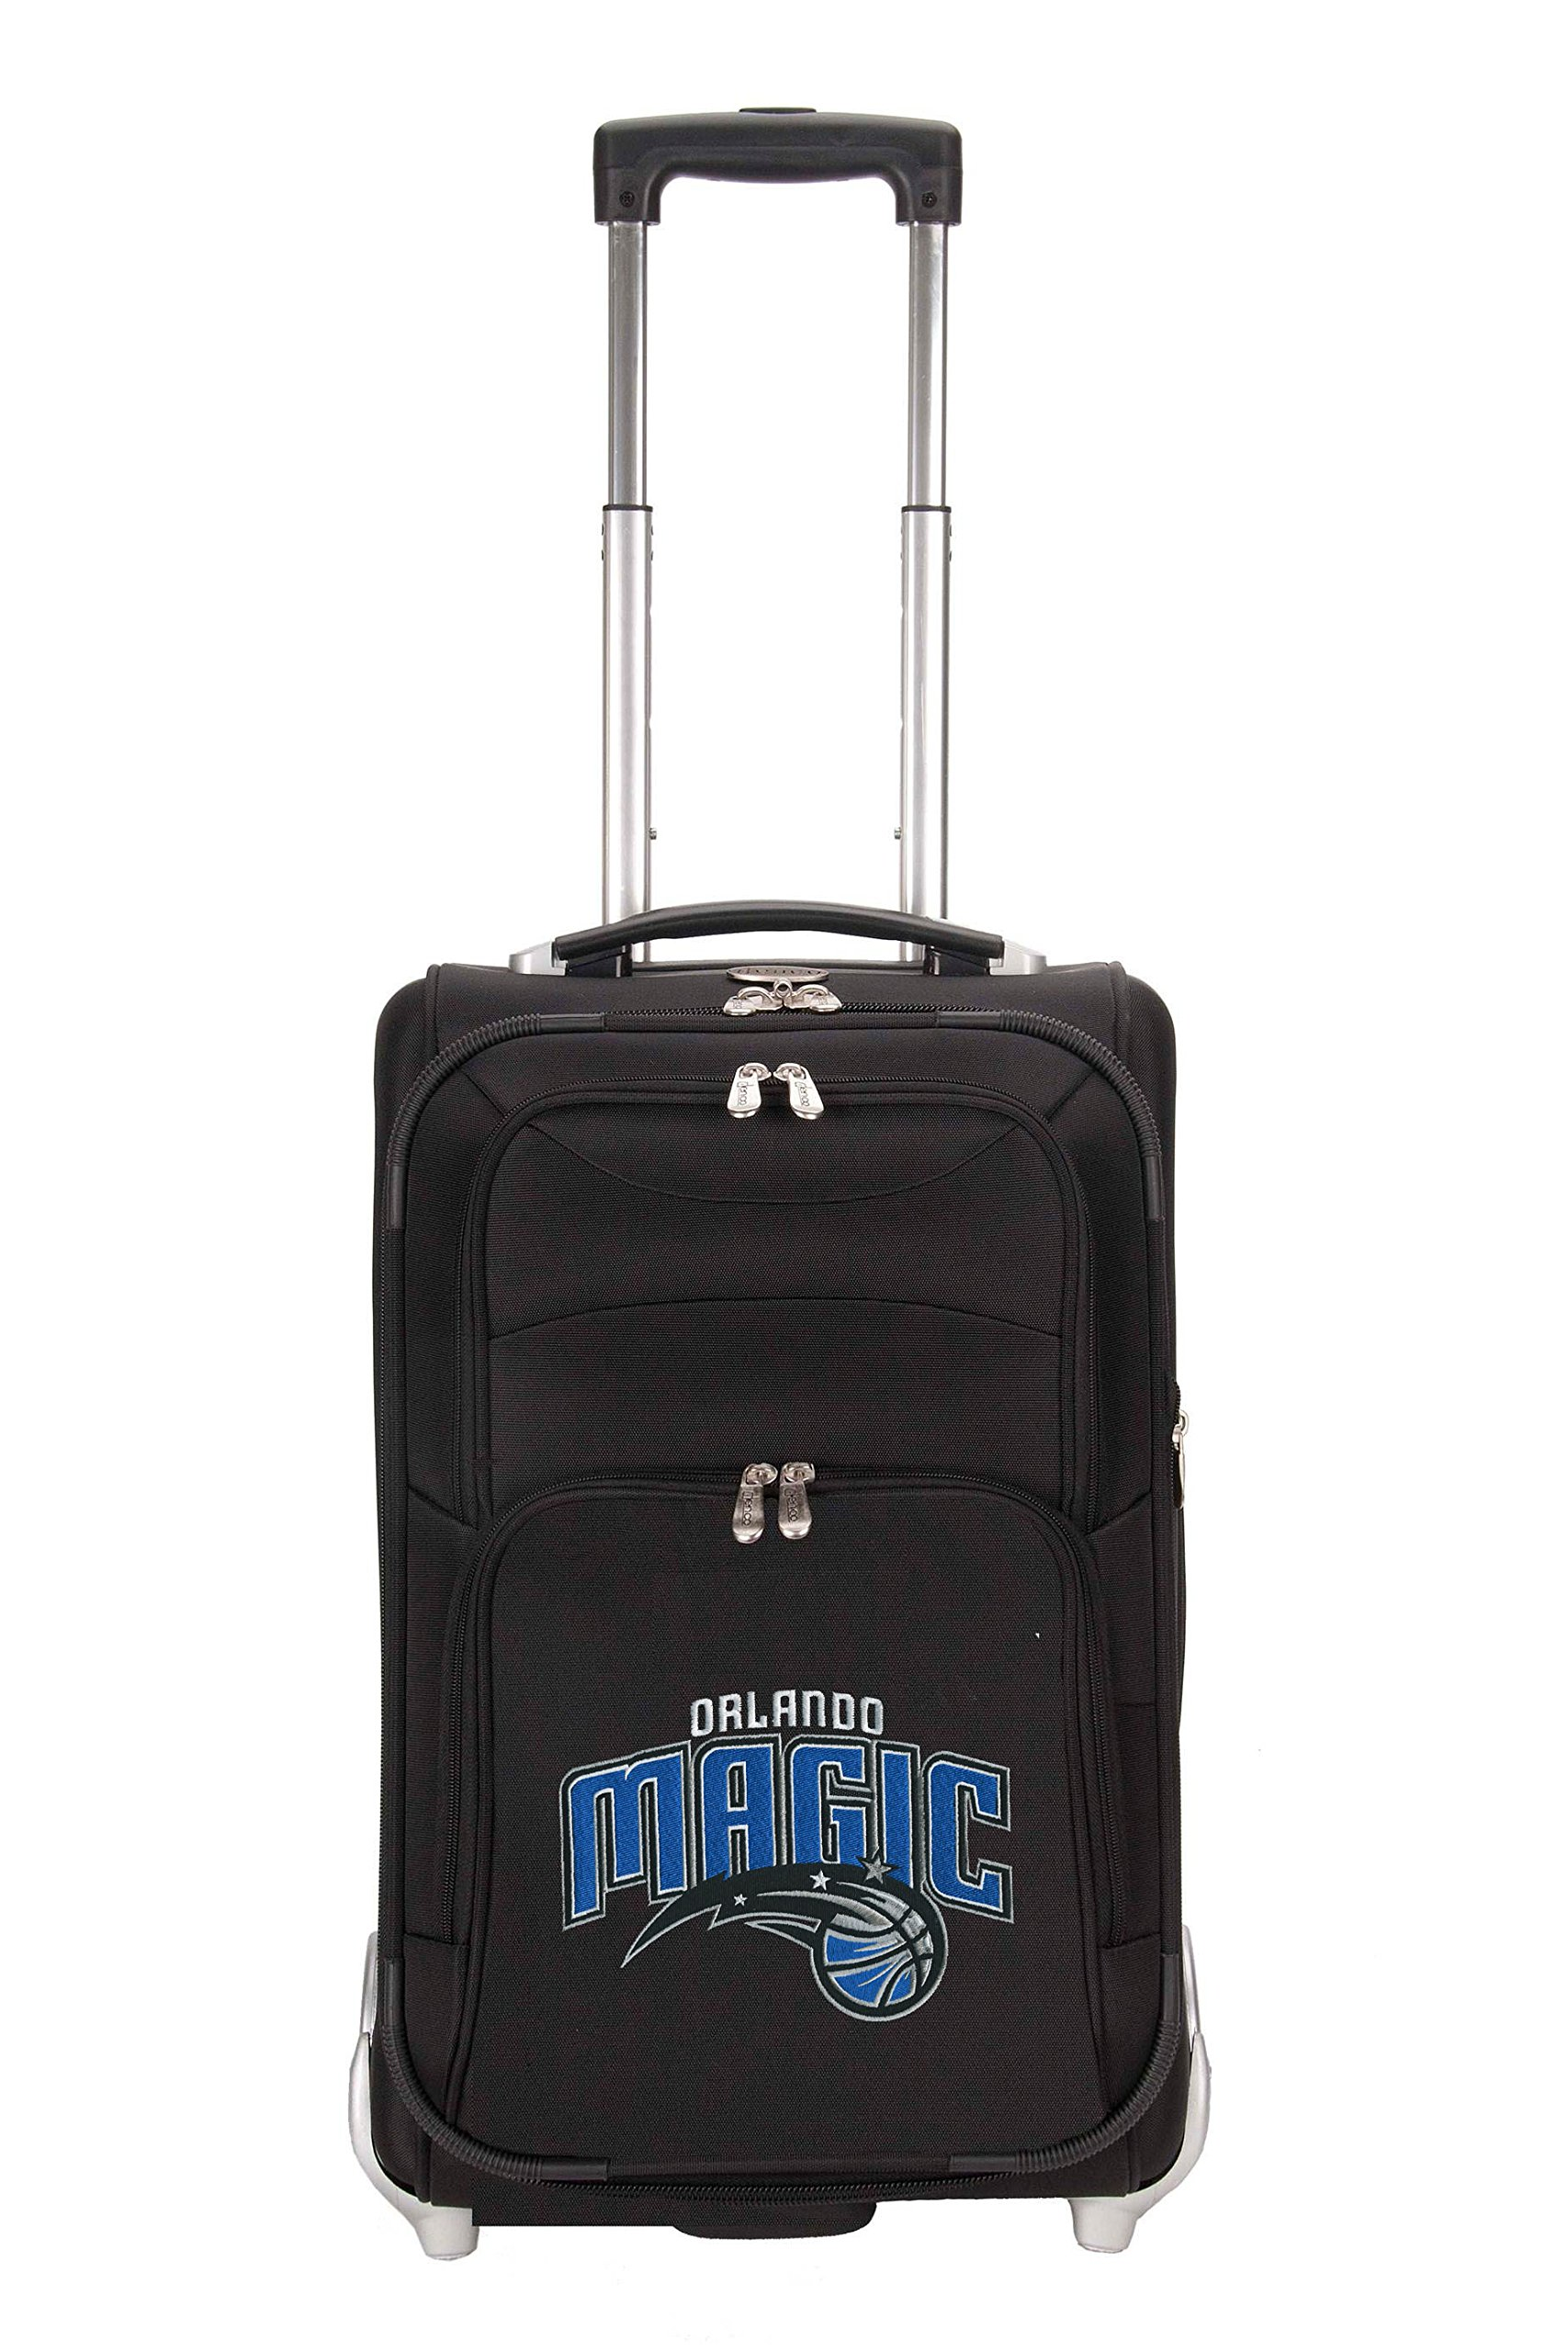 NBA Orlando Magic Denco 21-Inch Carry On Luggage, Black